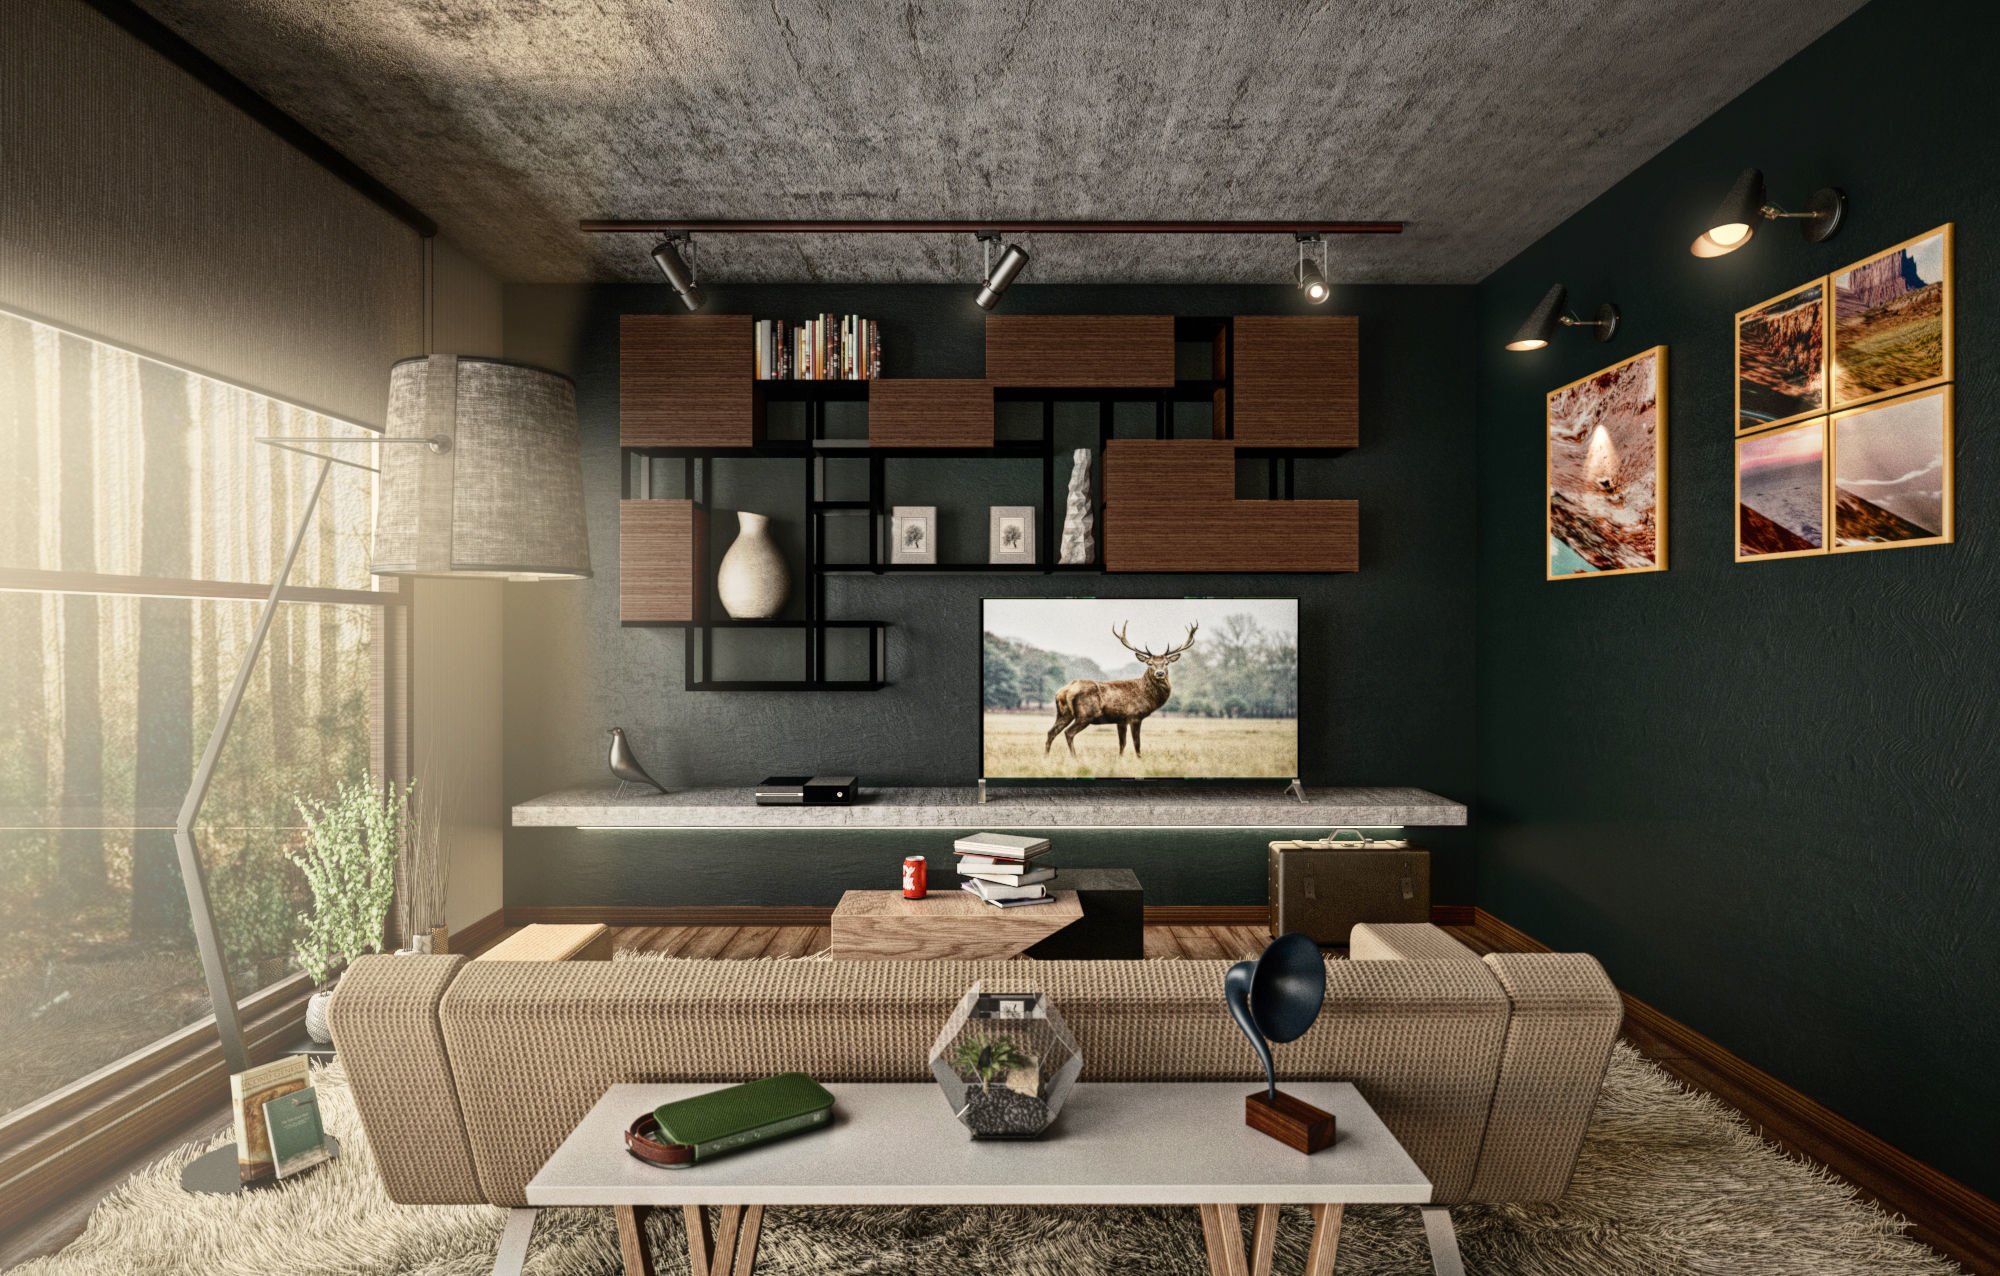 Architectural Interior Scene - Living Room